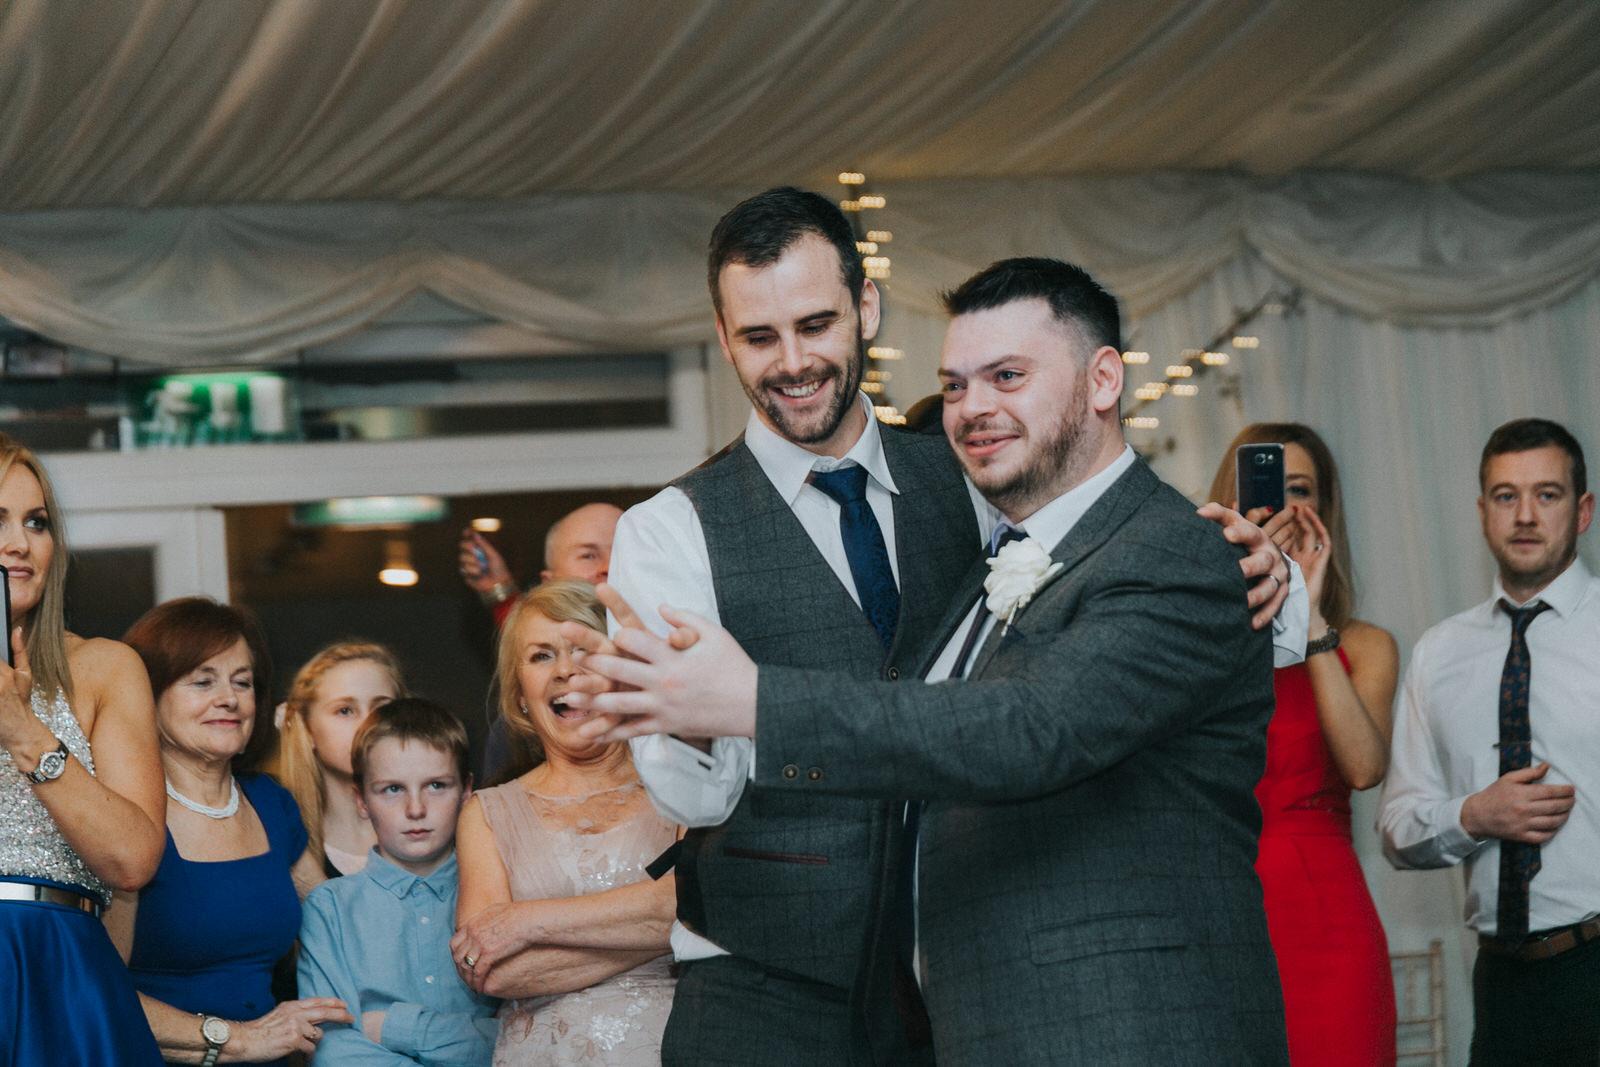 Clonabreany_wedding-photographer_roger_kenny_ireland_123.jpg